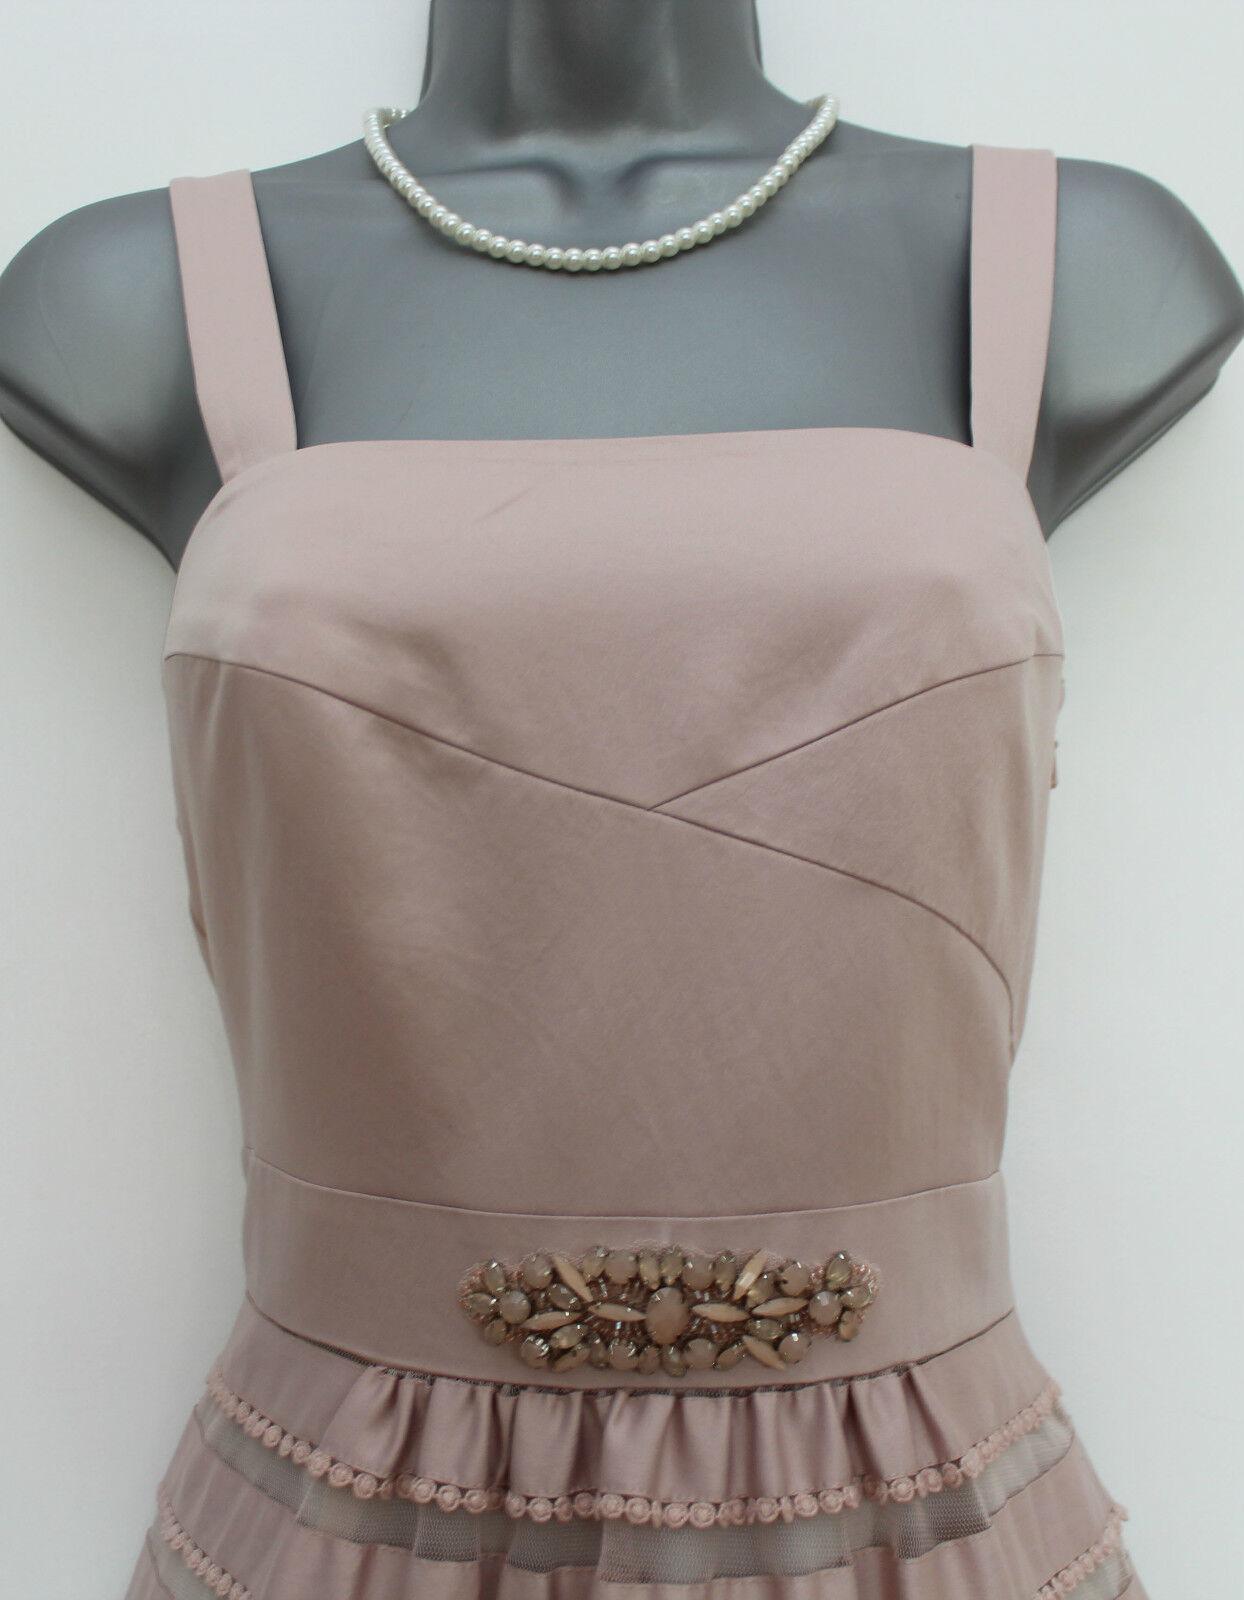 MONSOON Nude Nude Nude Soft Peach Lily Impreziosito Girovita Party Cocktail Dress 12 bf160b